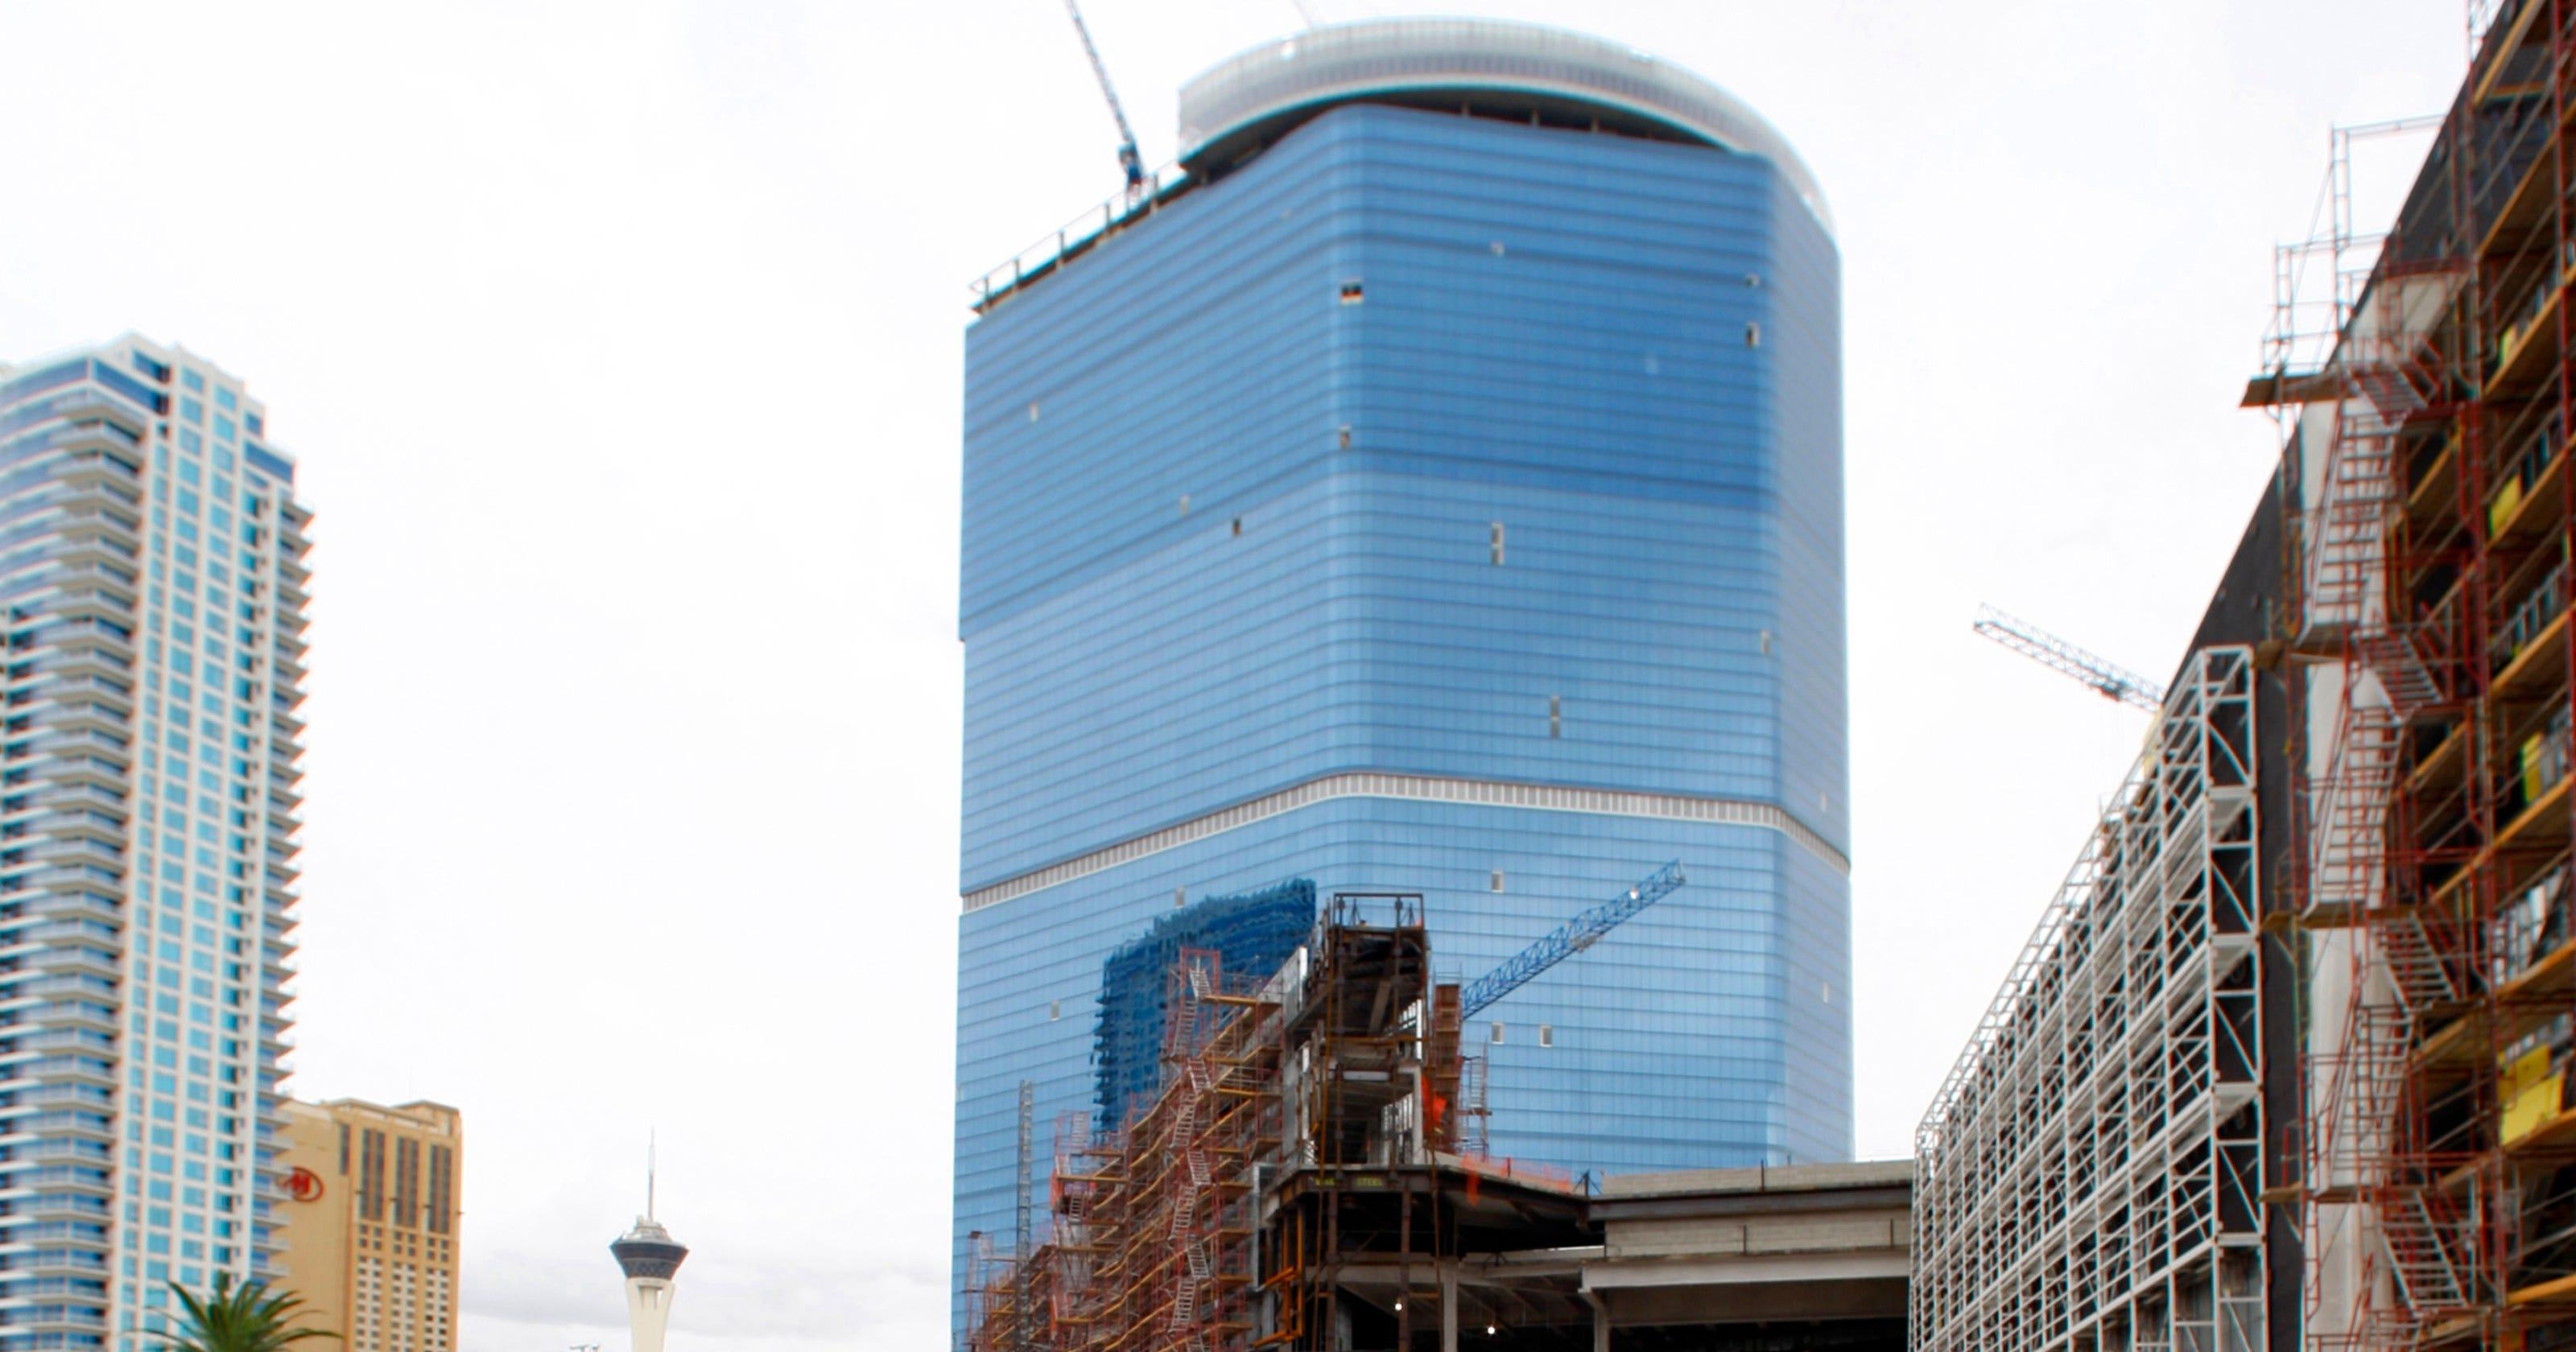 Las Vegas Strip to get 4,000-room Marriott resort